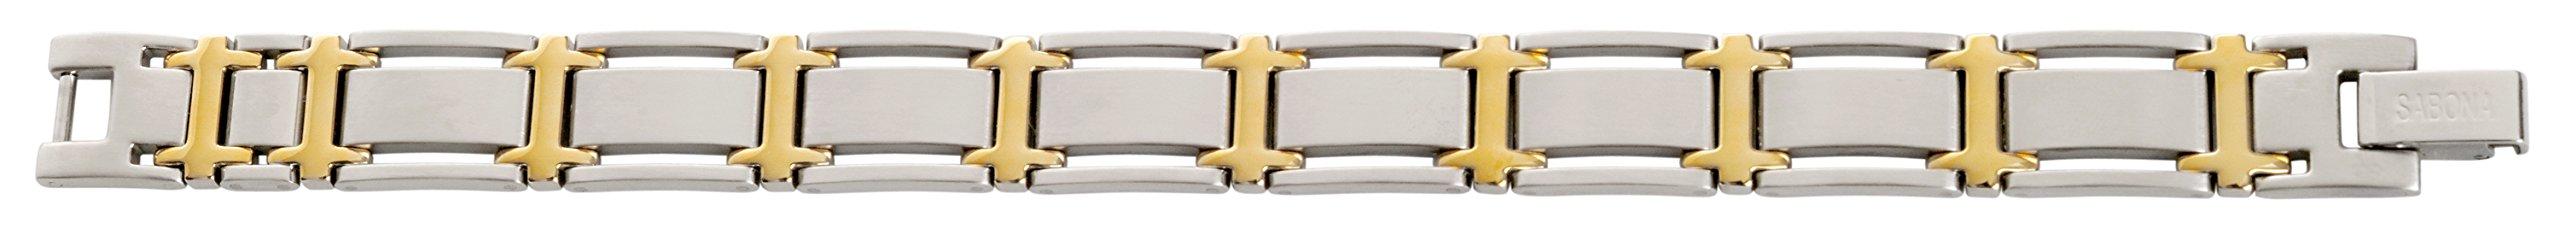 Sabona Executive Symmetry Duet Magnetic Bracelet - Large by Sabona (Image #2)